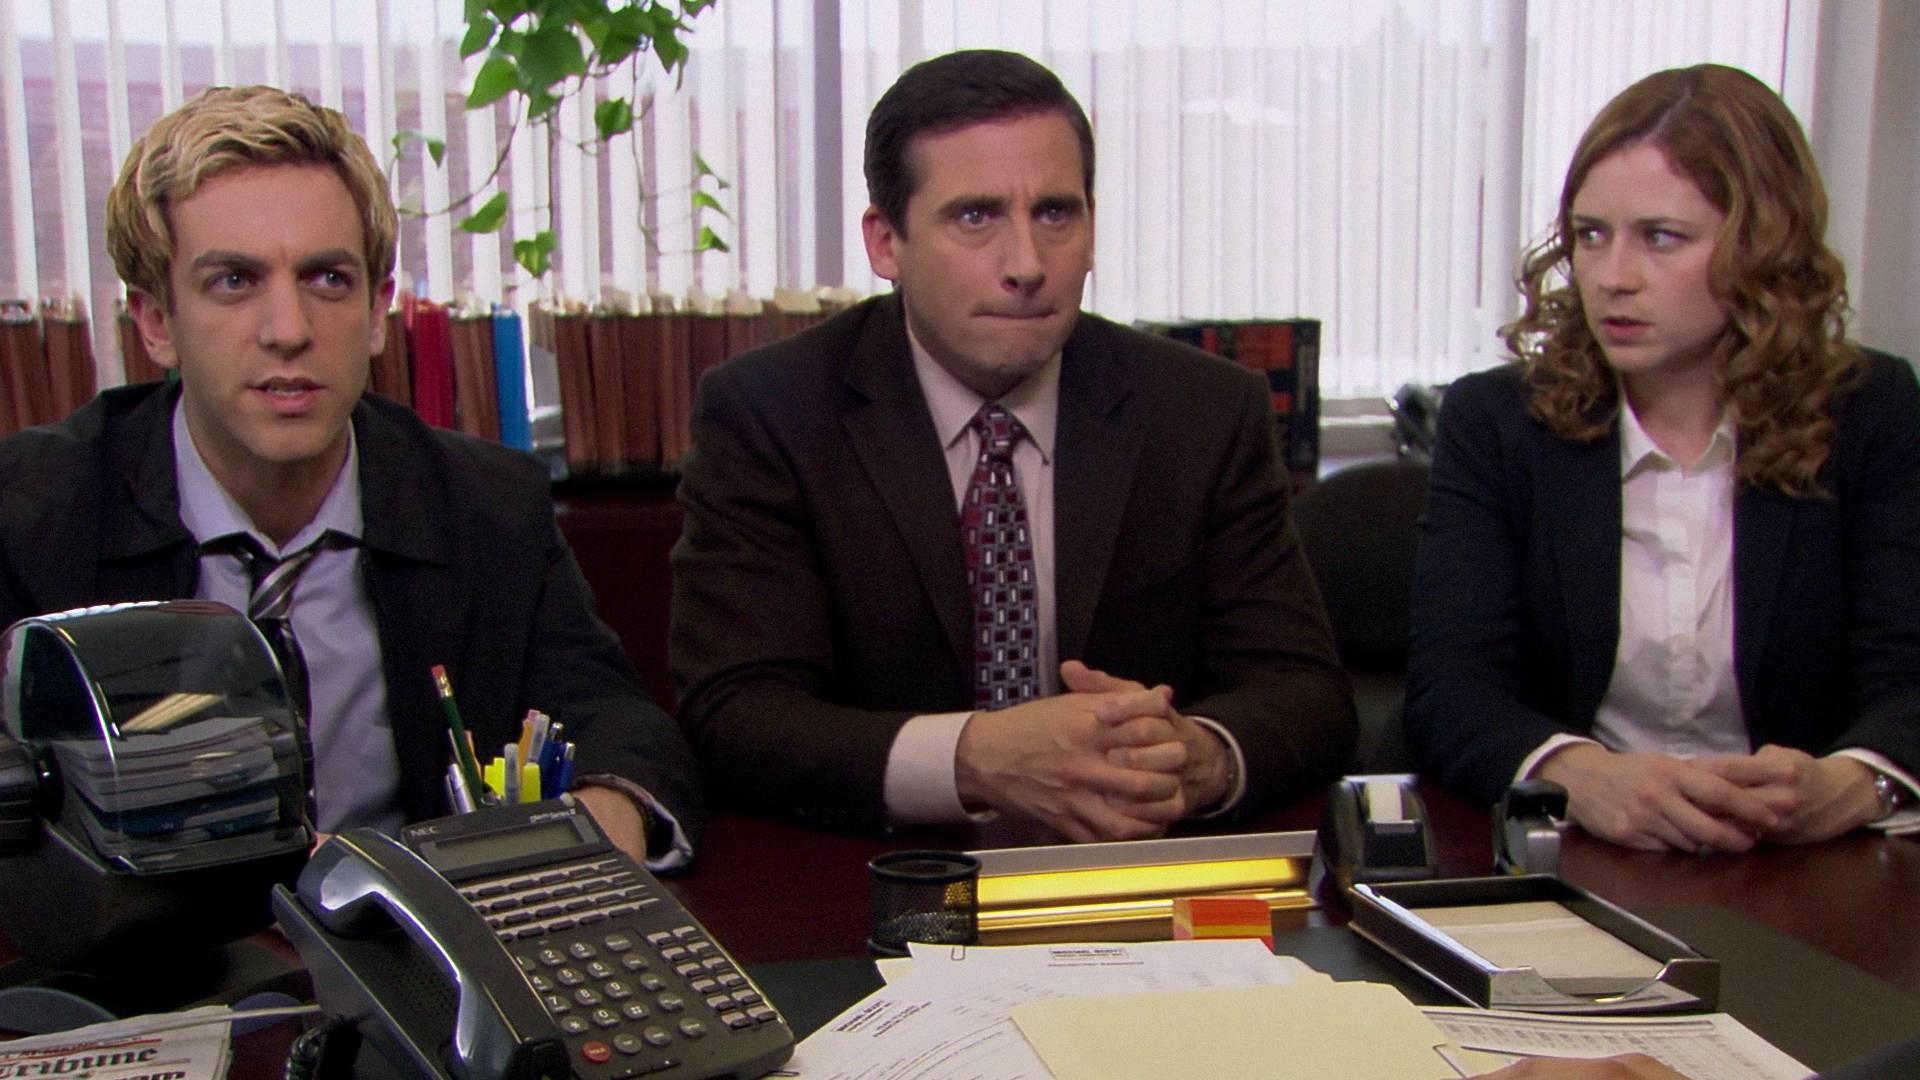 The Office Season 5 Episode 25